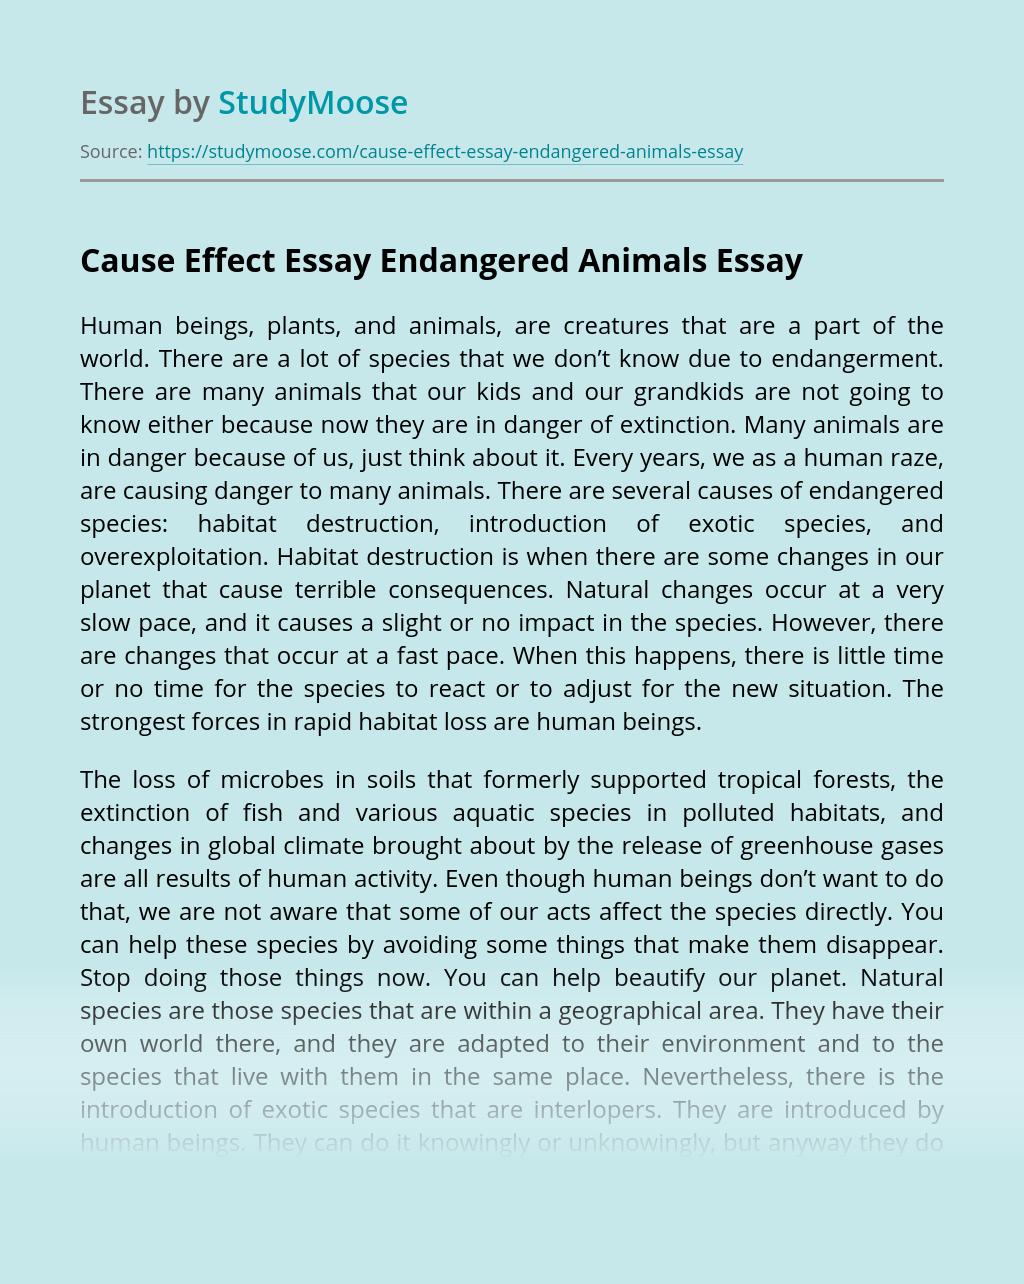 Cause Effect Essay Endangered Animals